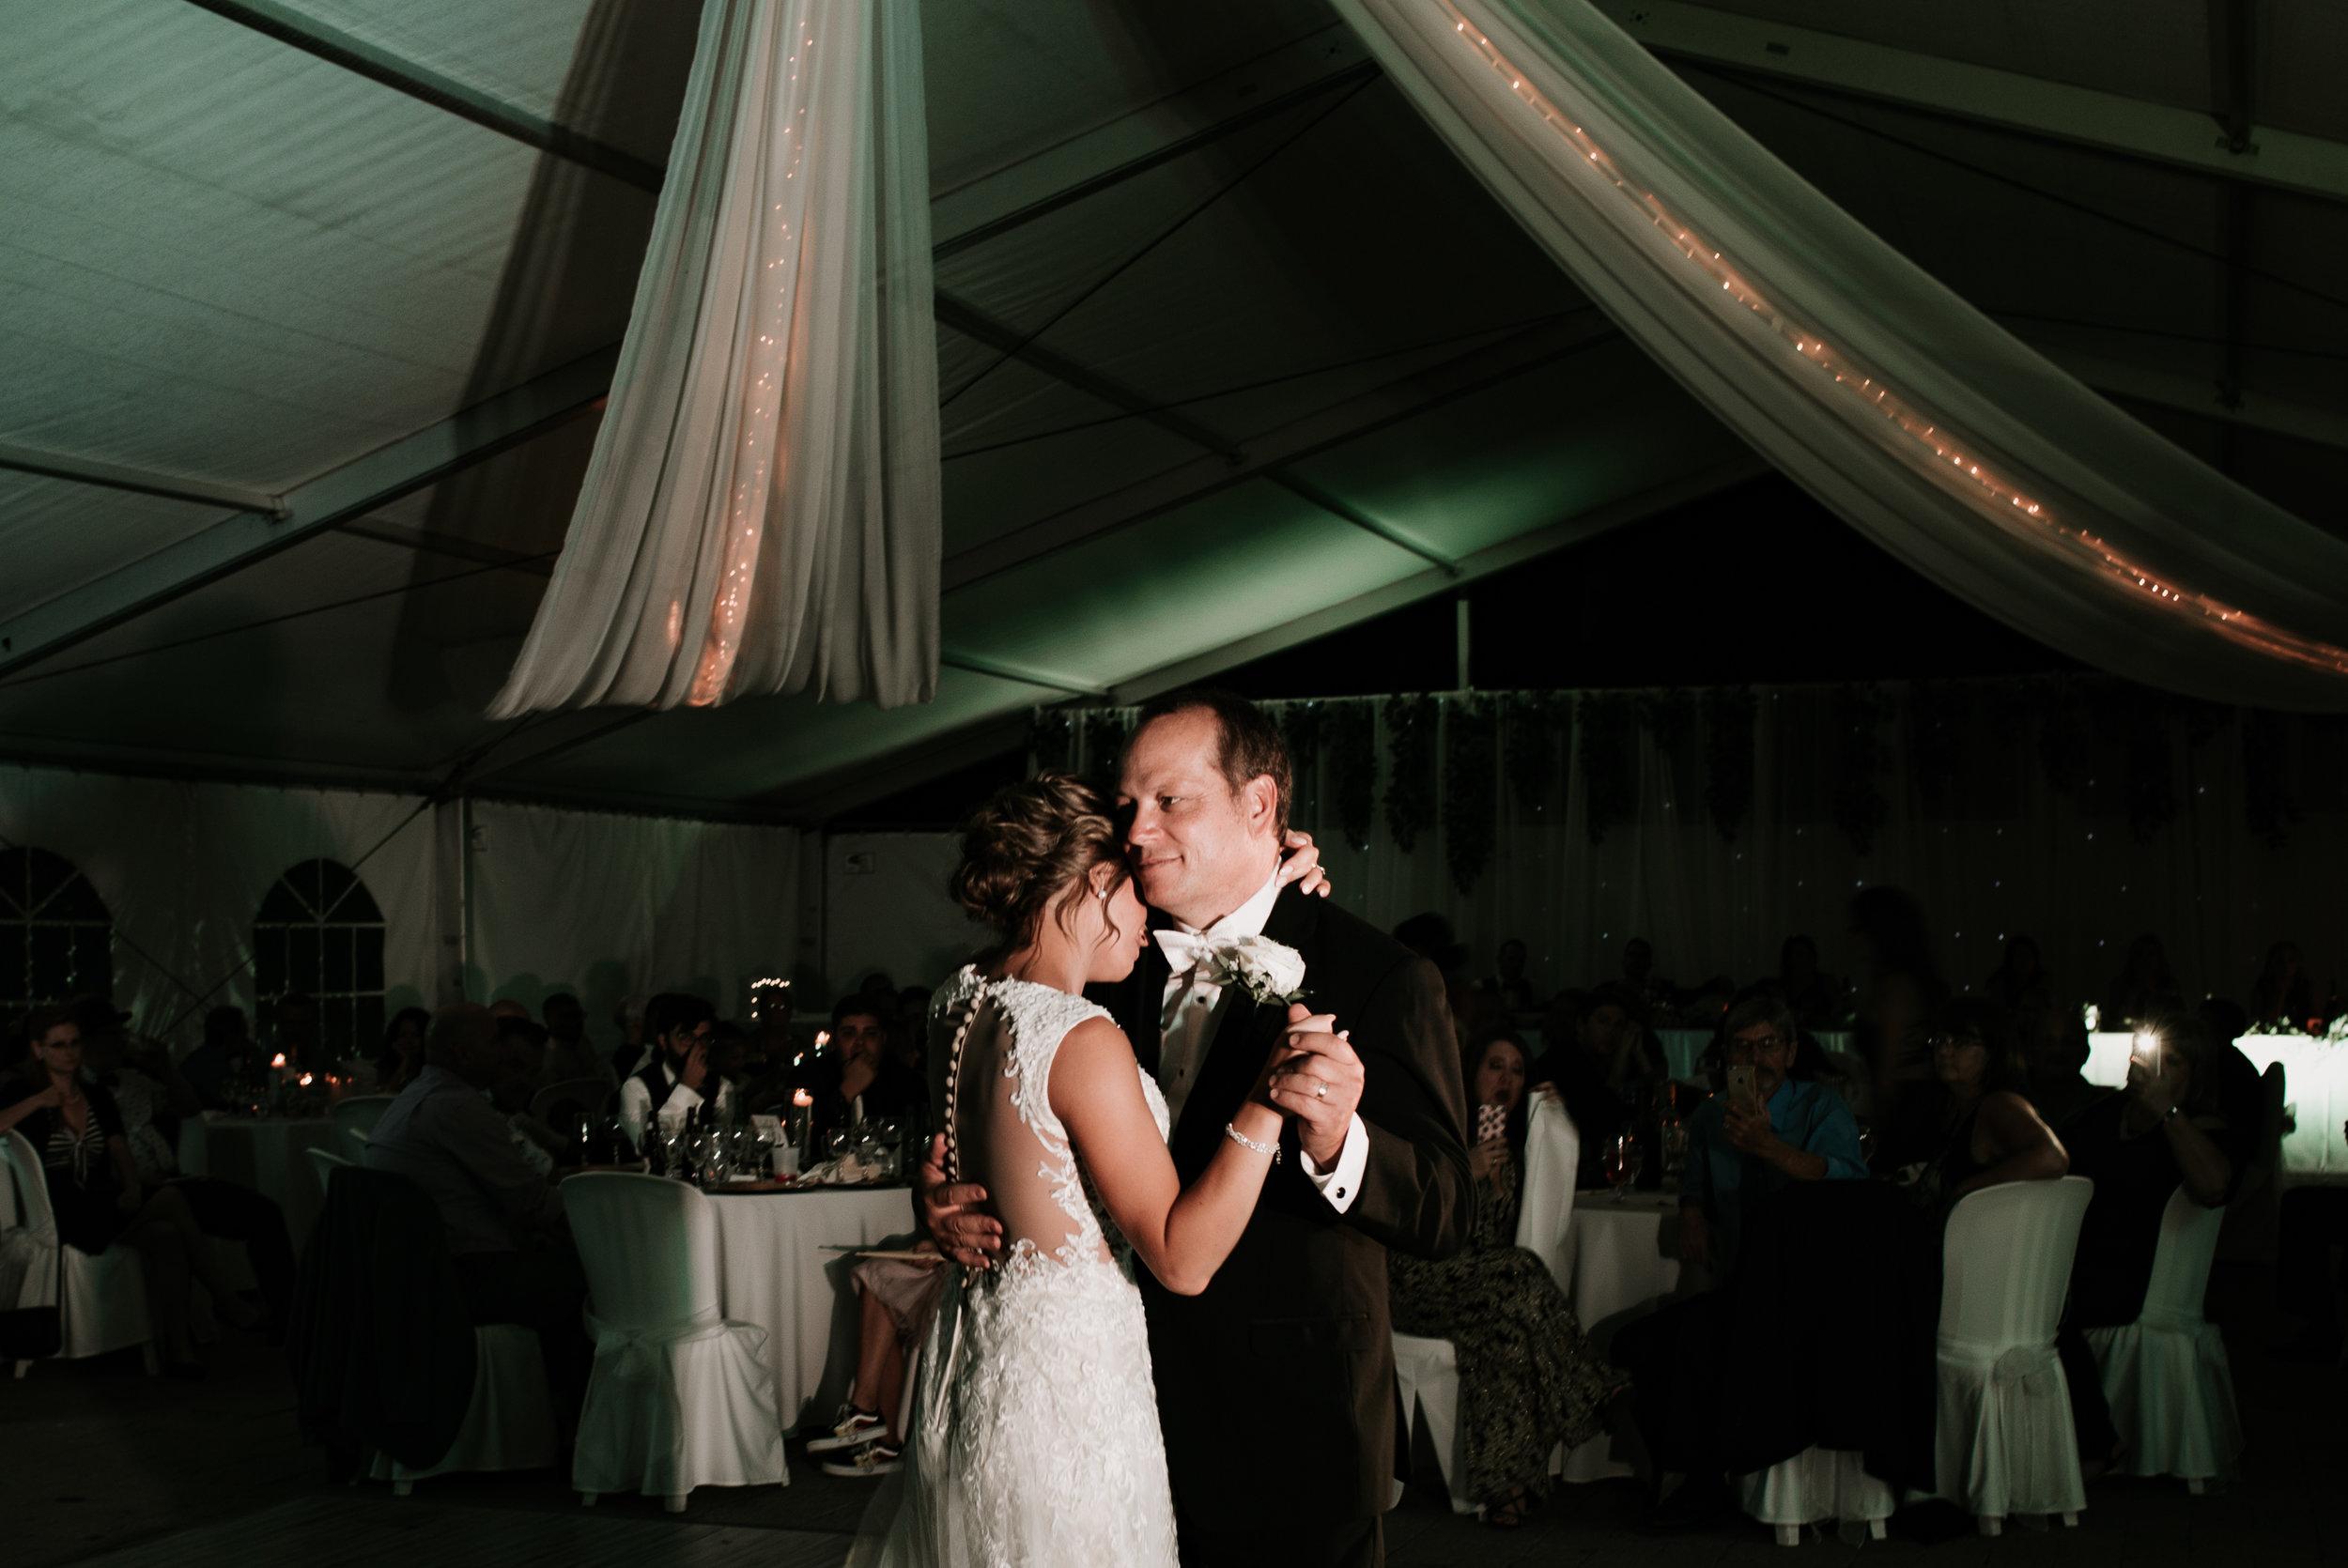 Claremont_fourseasons_Wedding-515.jpg